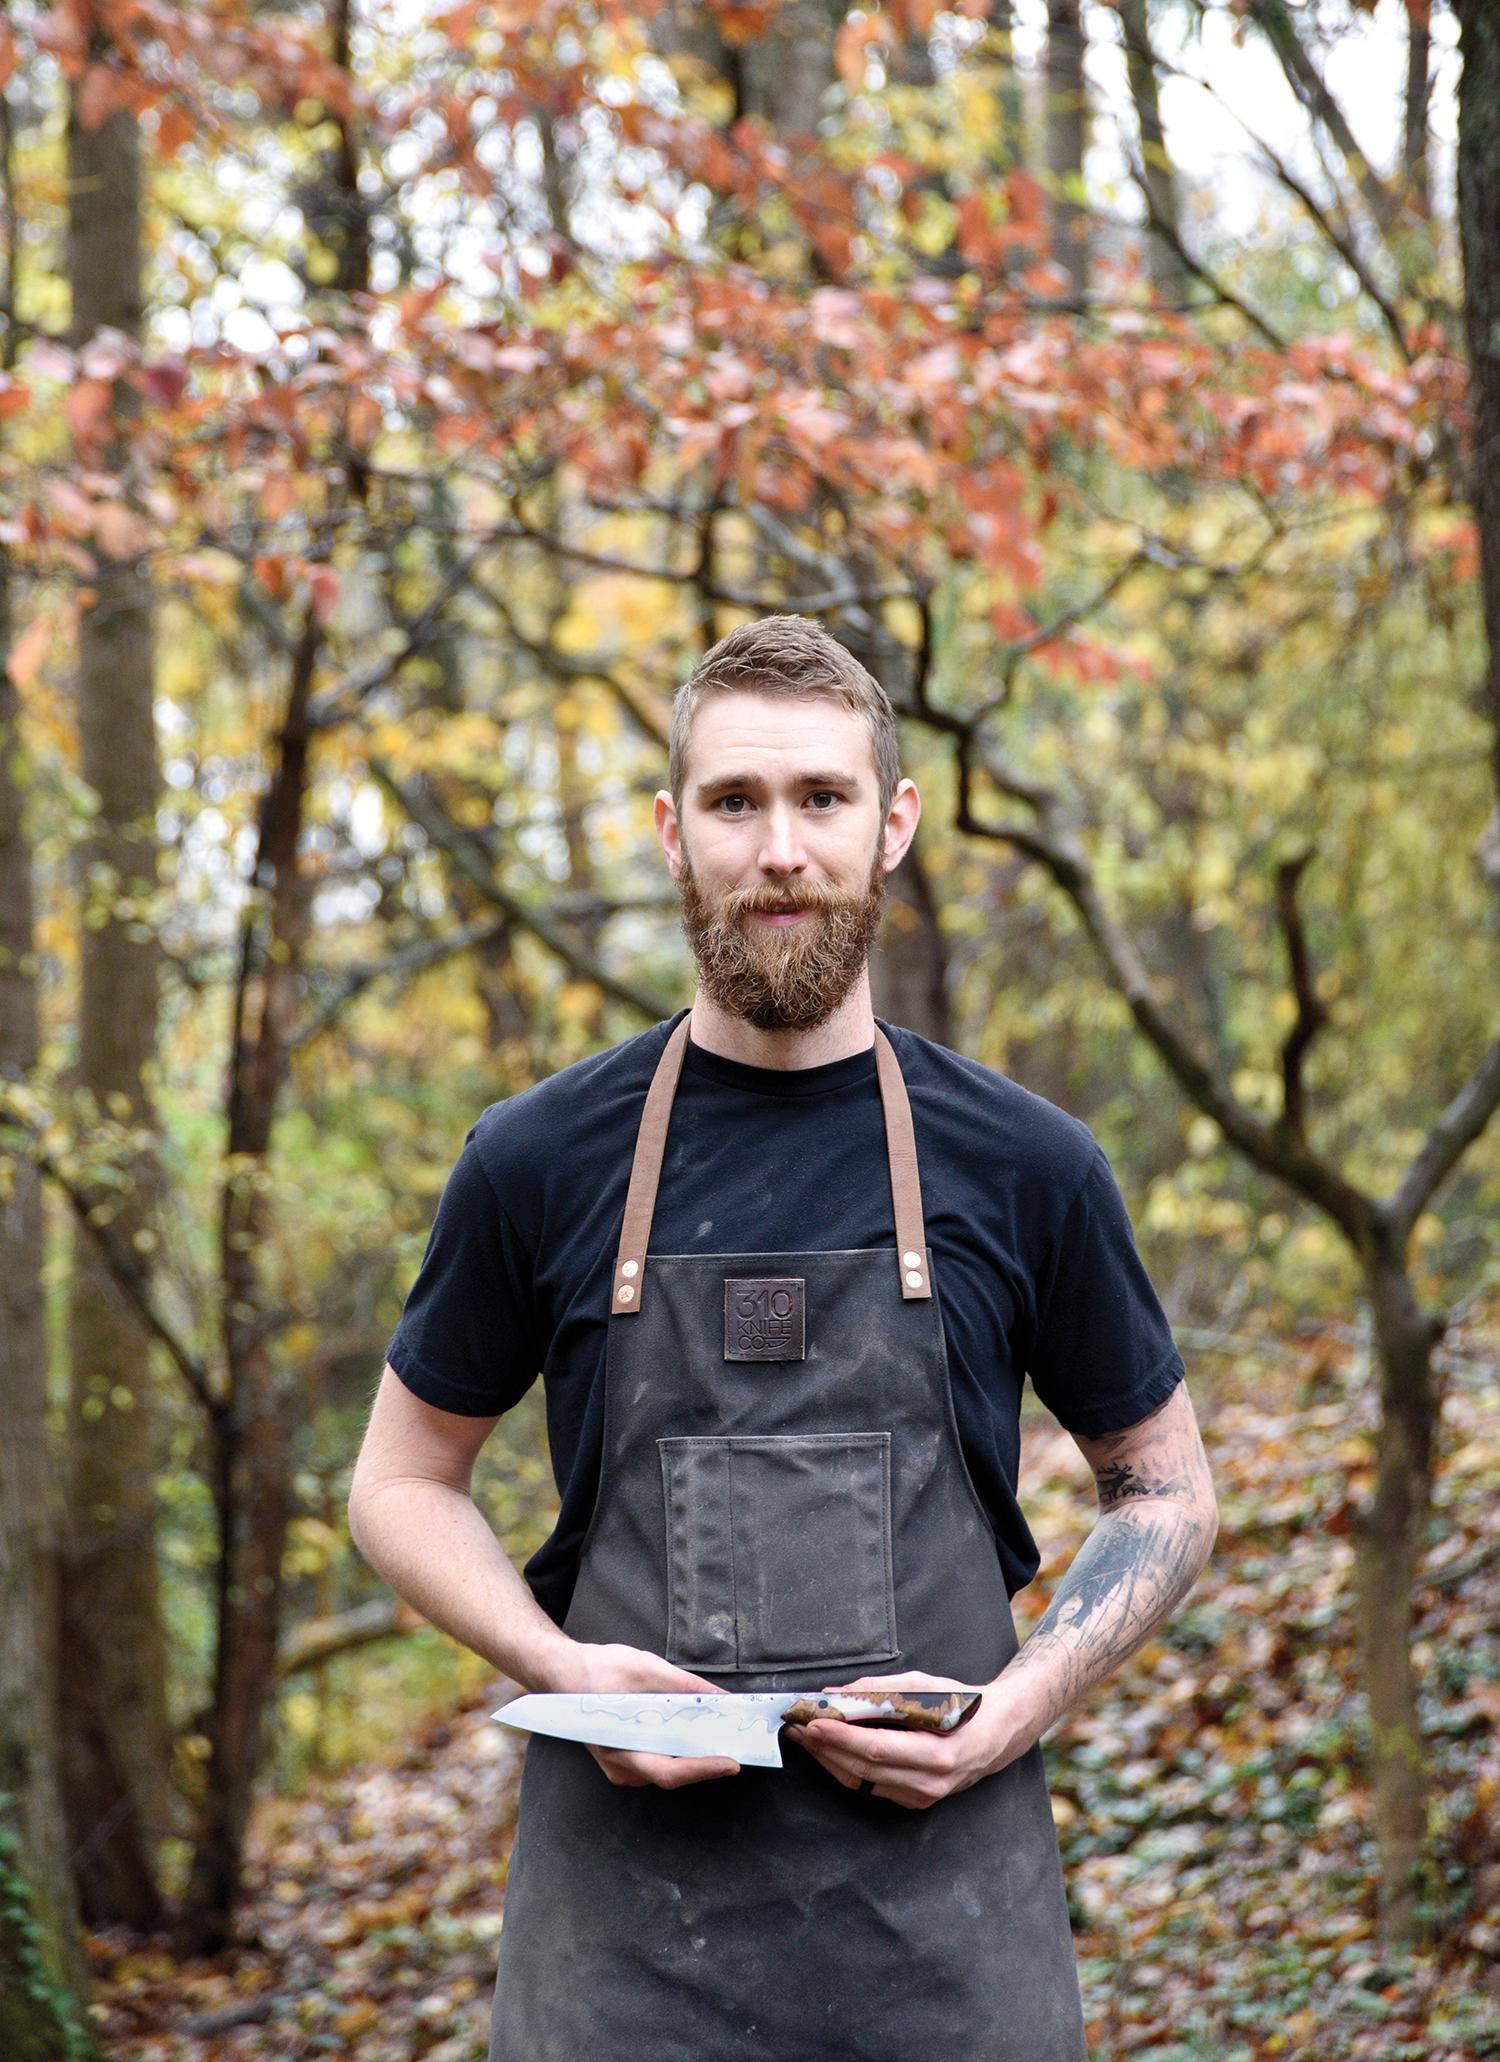 Ryan-Pepper-Main-Portrait-RZ.jpg